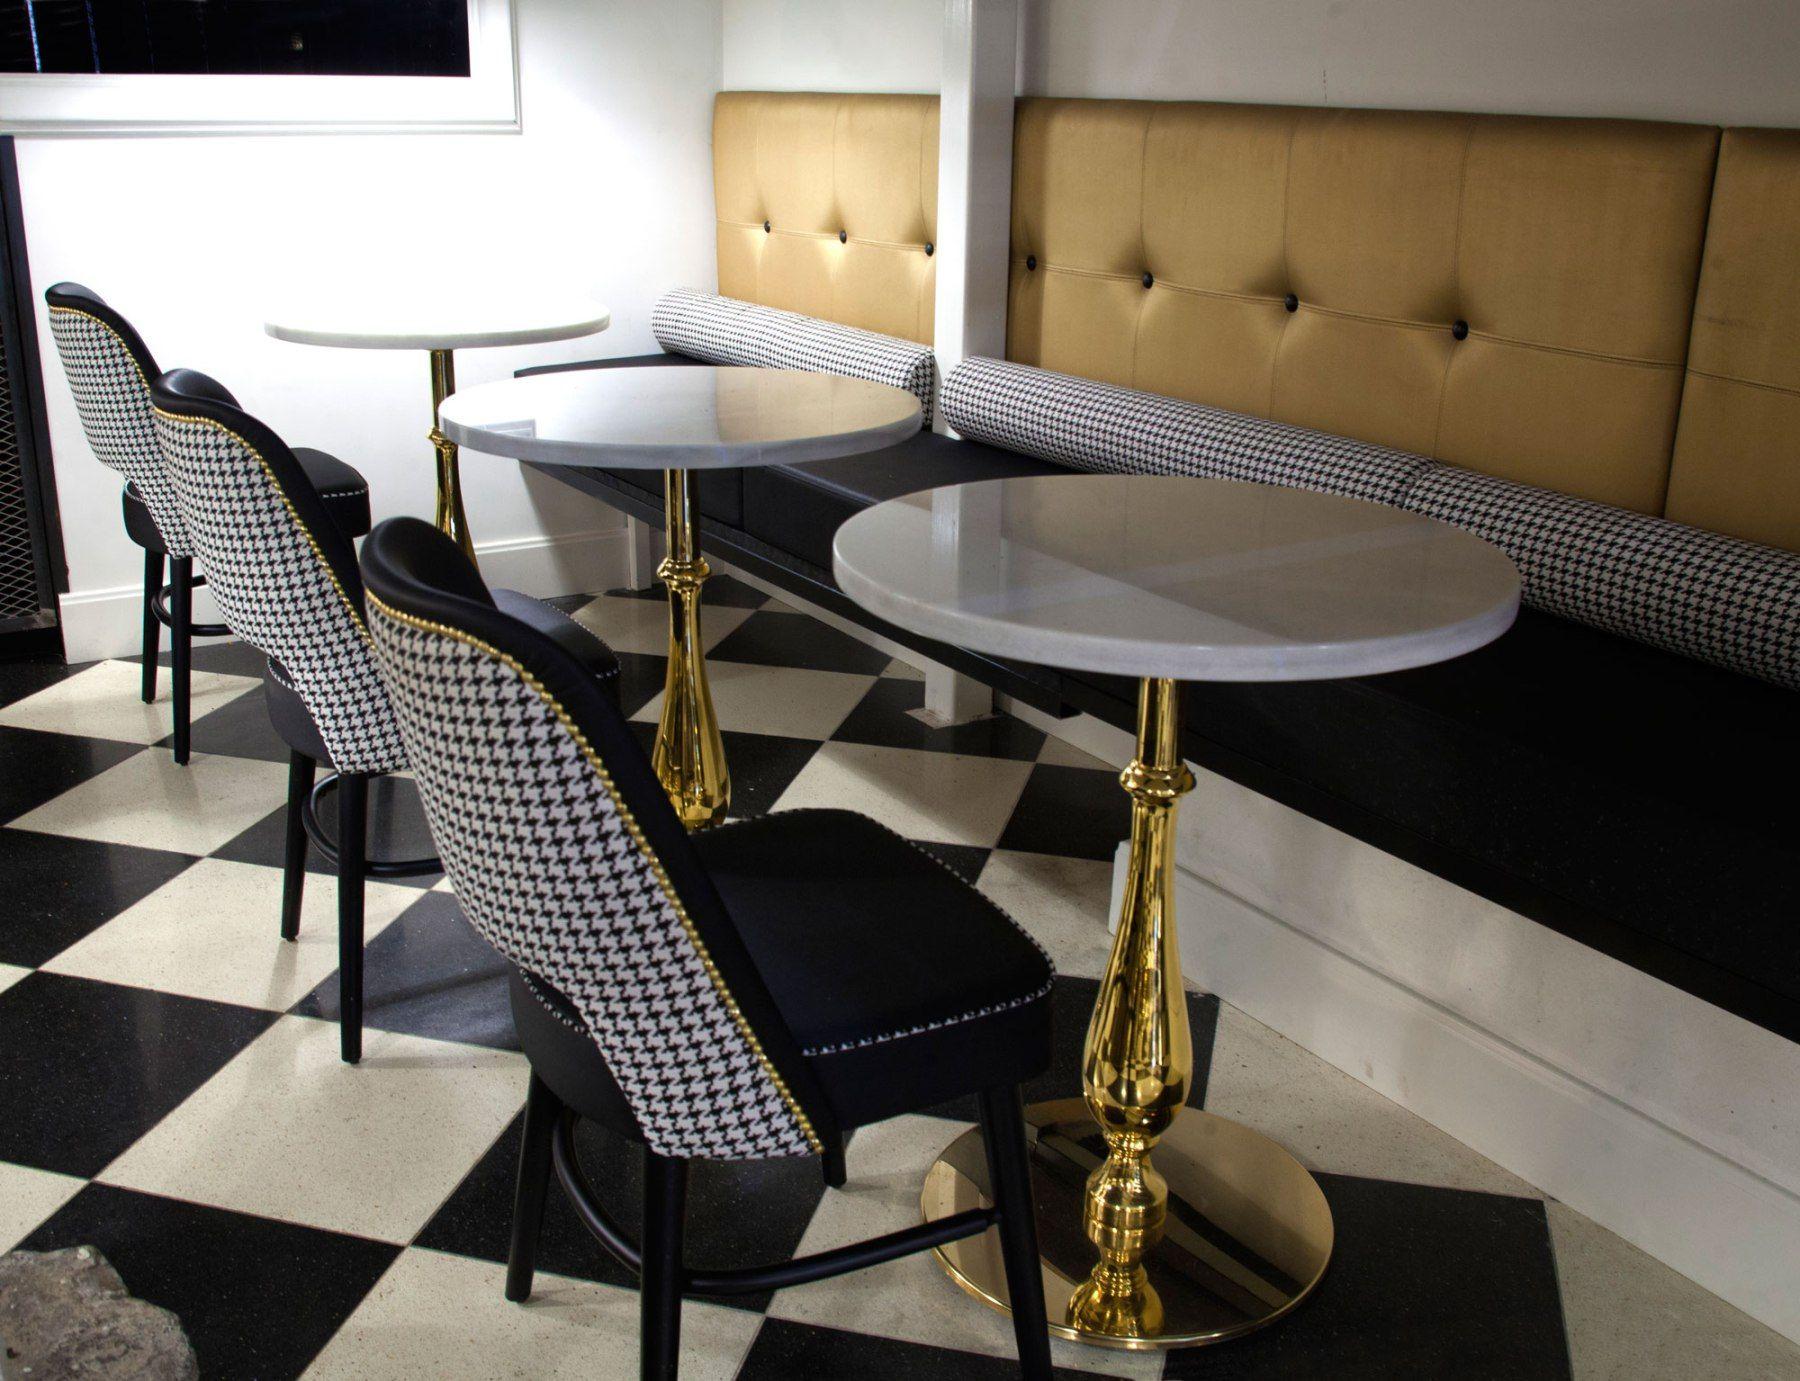 restaurante u la reina arenal u bilbao desing u interior mobiliario u by verges